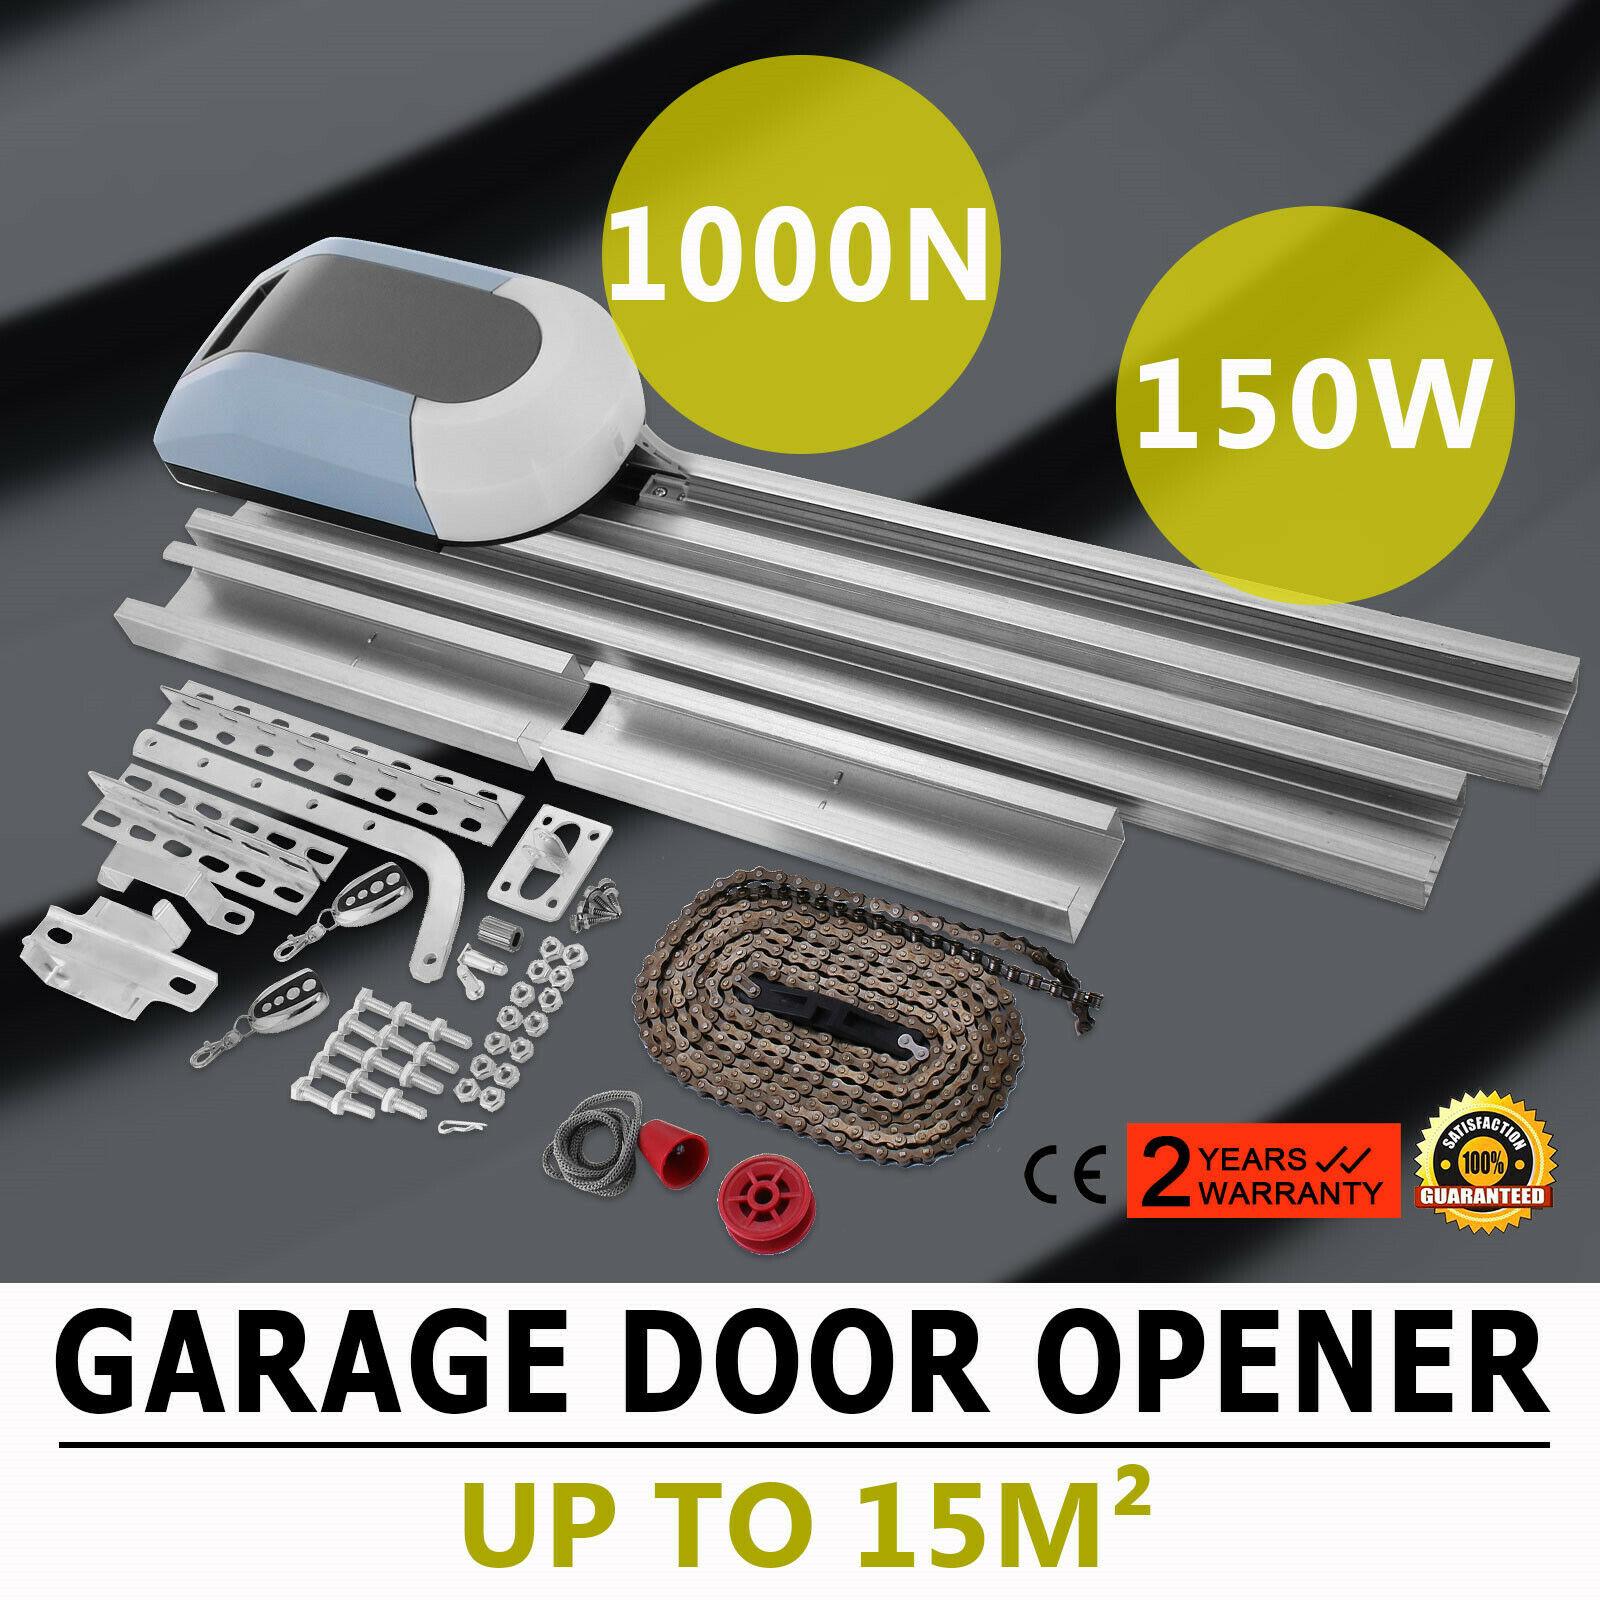 Automatic GARAGE DOOR OPENER Motor Electric Retractable Operator + Remotes 1000N